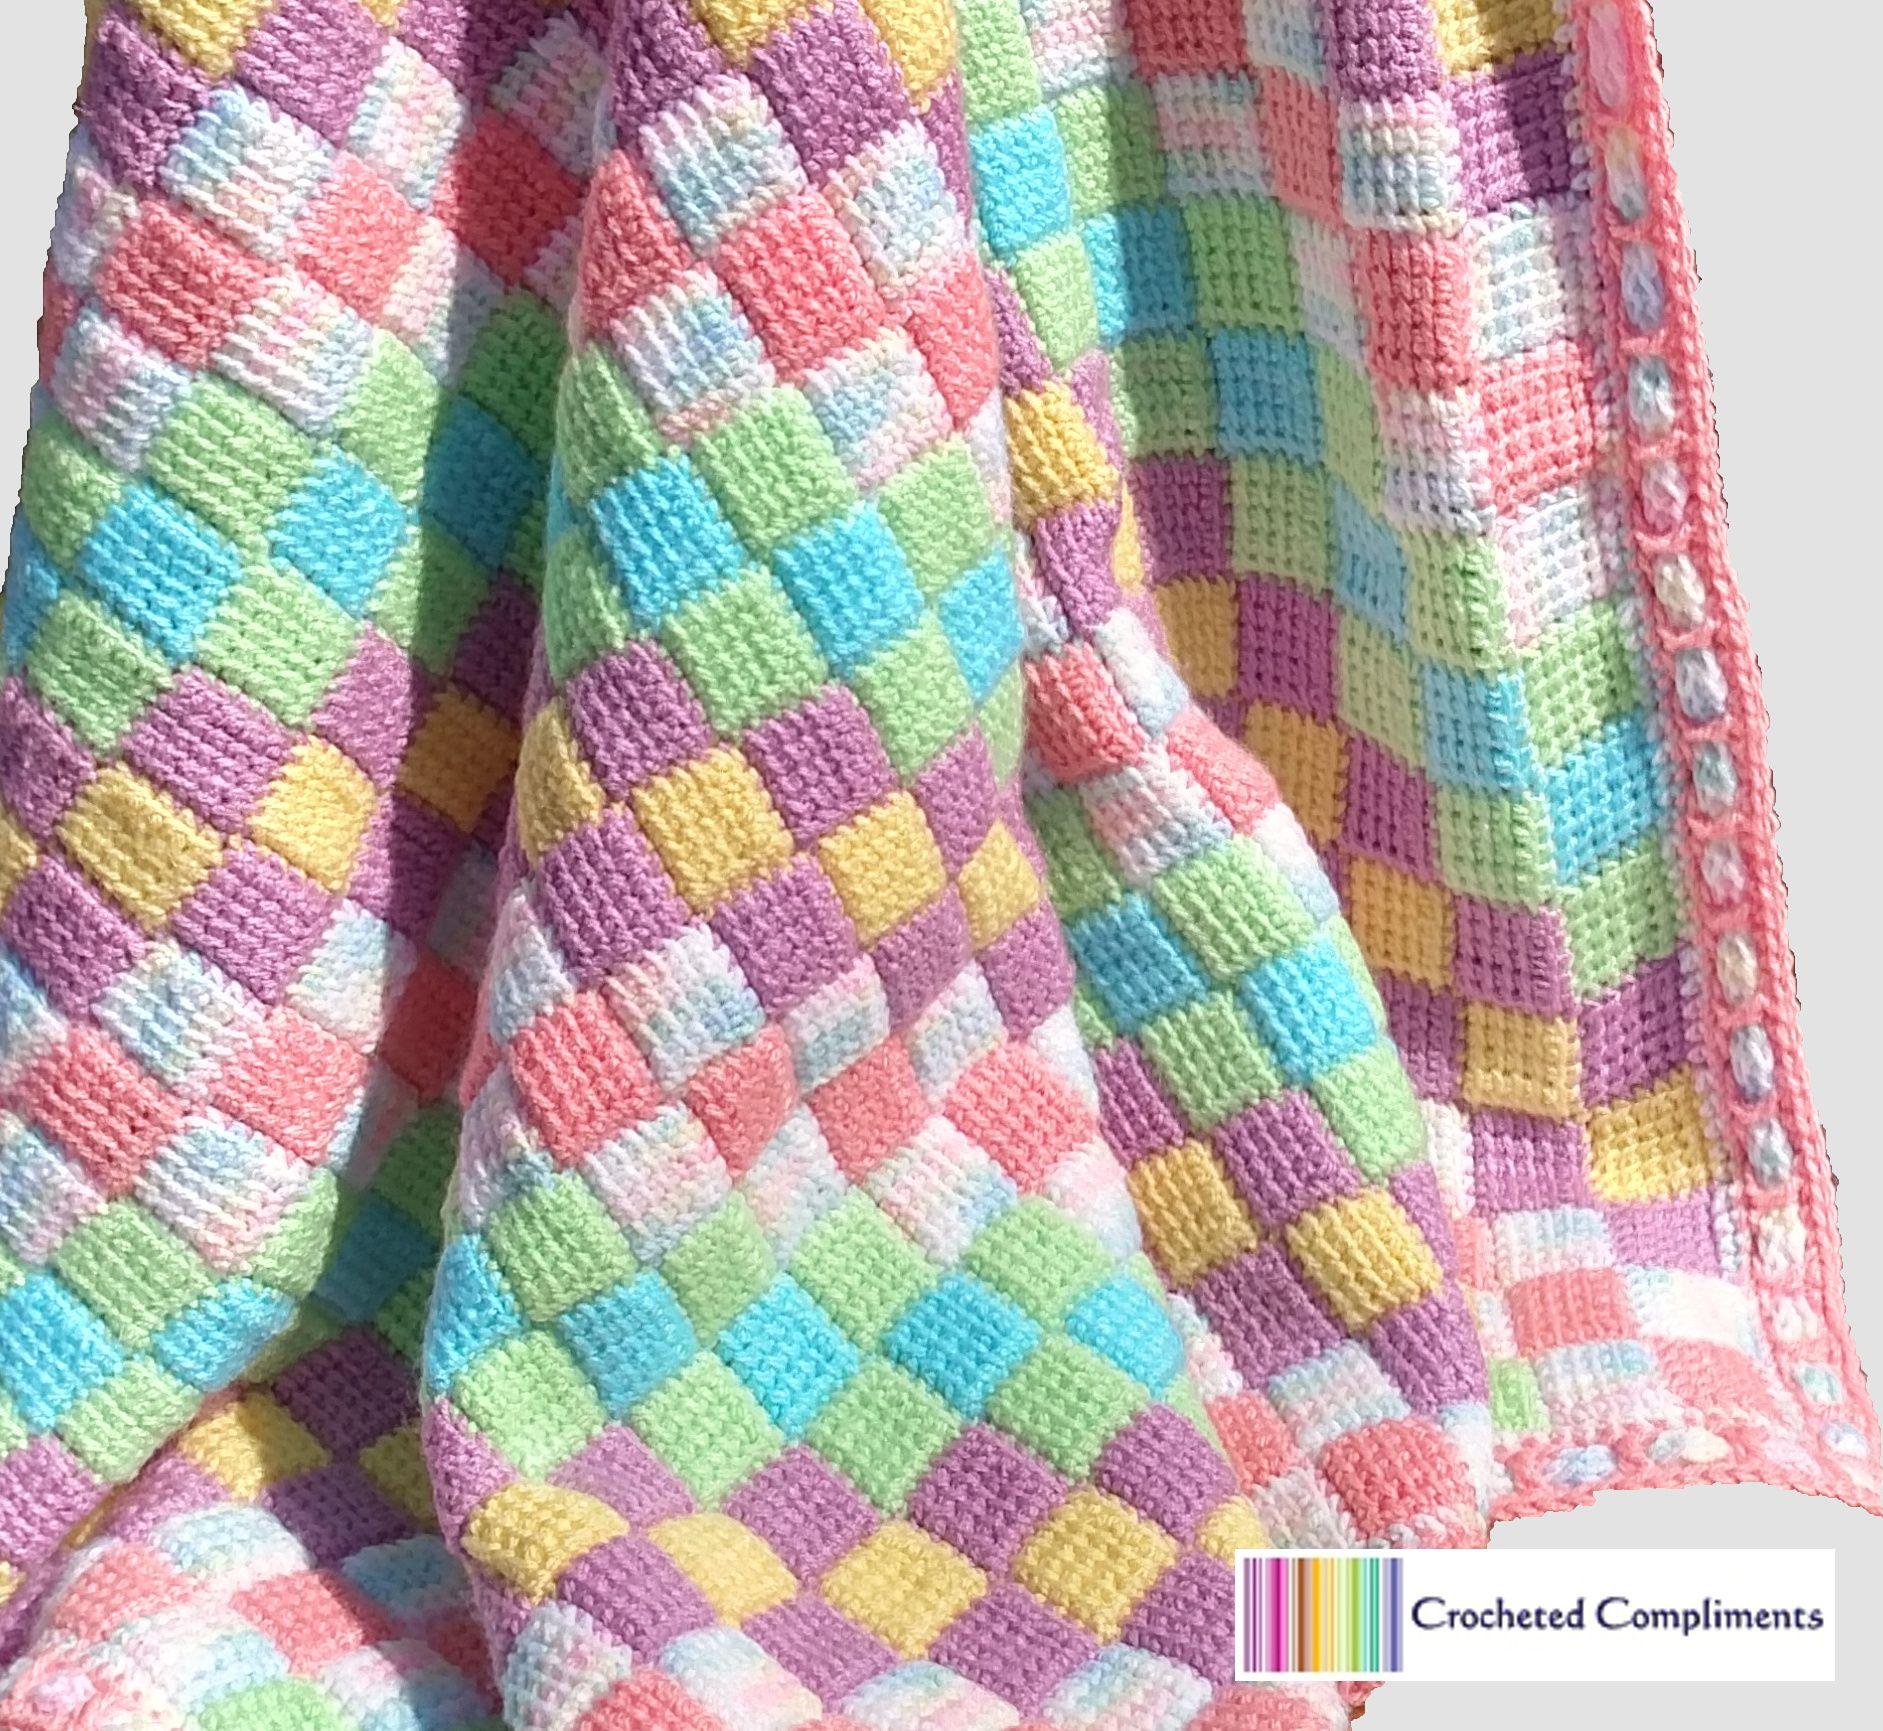 CrochetedCompliments.com Tunisian crochet entrelac baby blanket ...